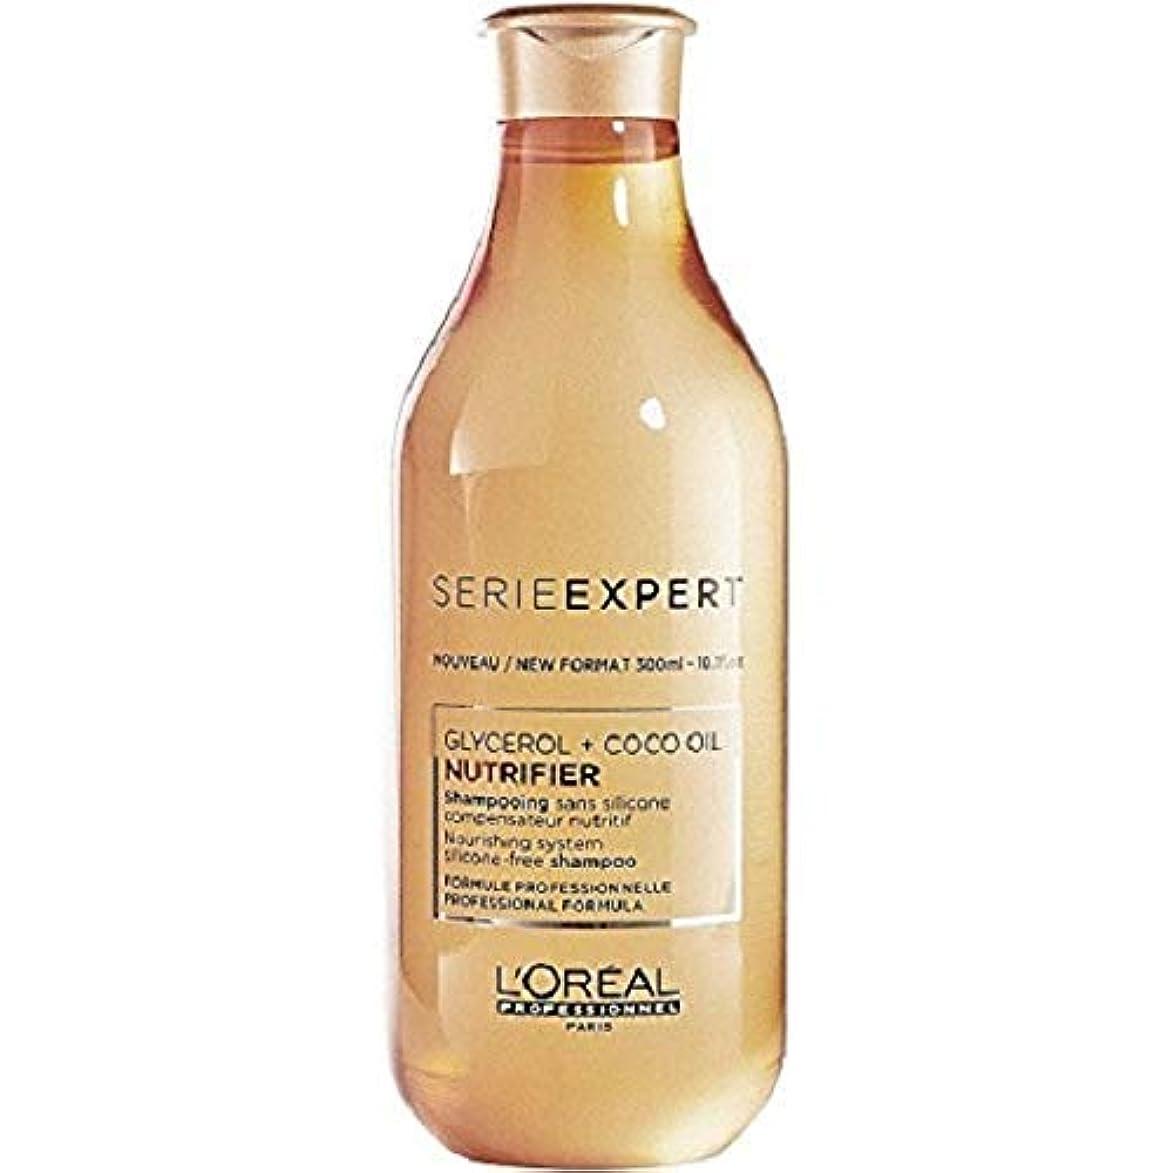 L'Oreal Serie Expert Glycerol + Coco Oil NUTRIFIER Nourishing System Silicone-Free Shampoo 300 ml [並行輸入品]